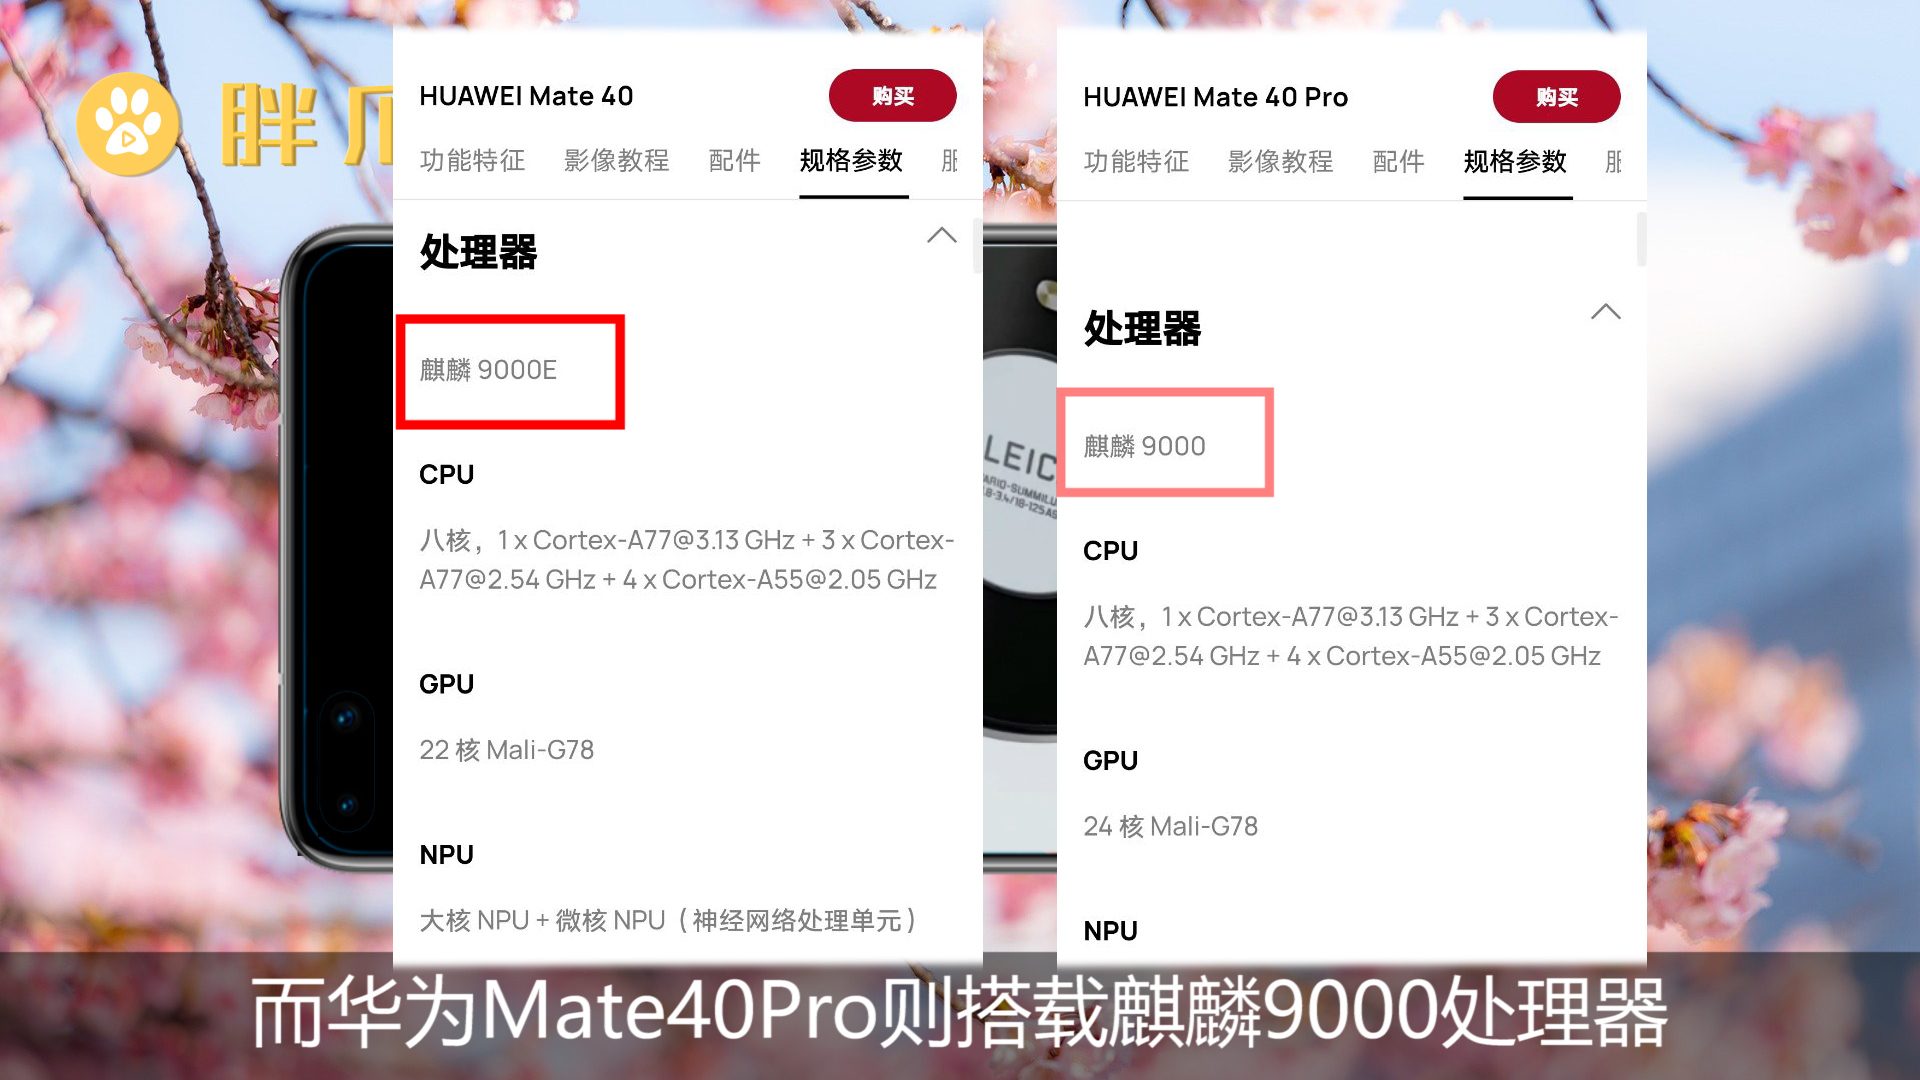 mate40和mate40pro区别(2)